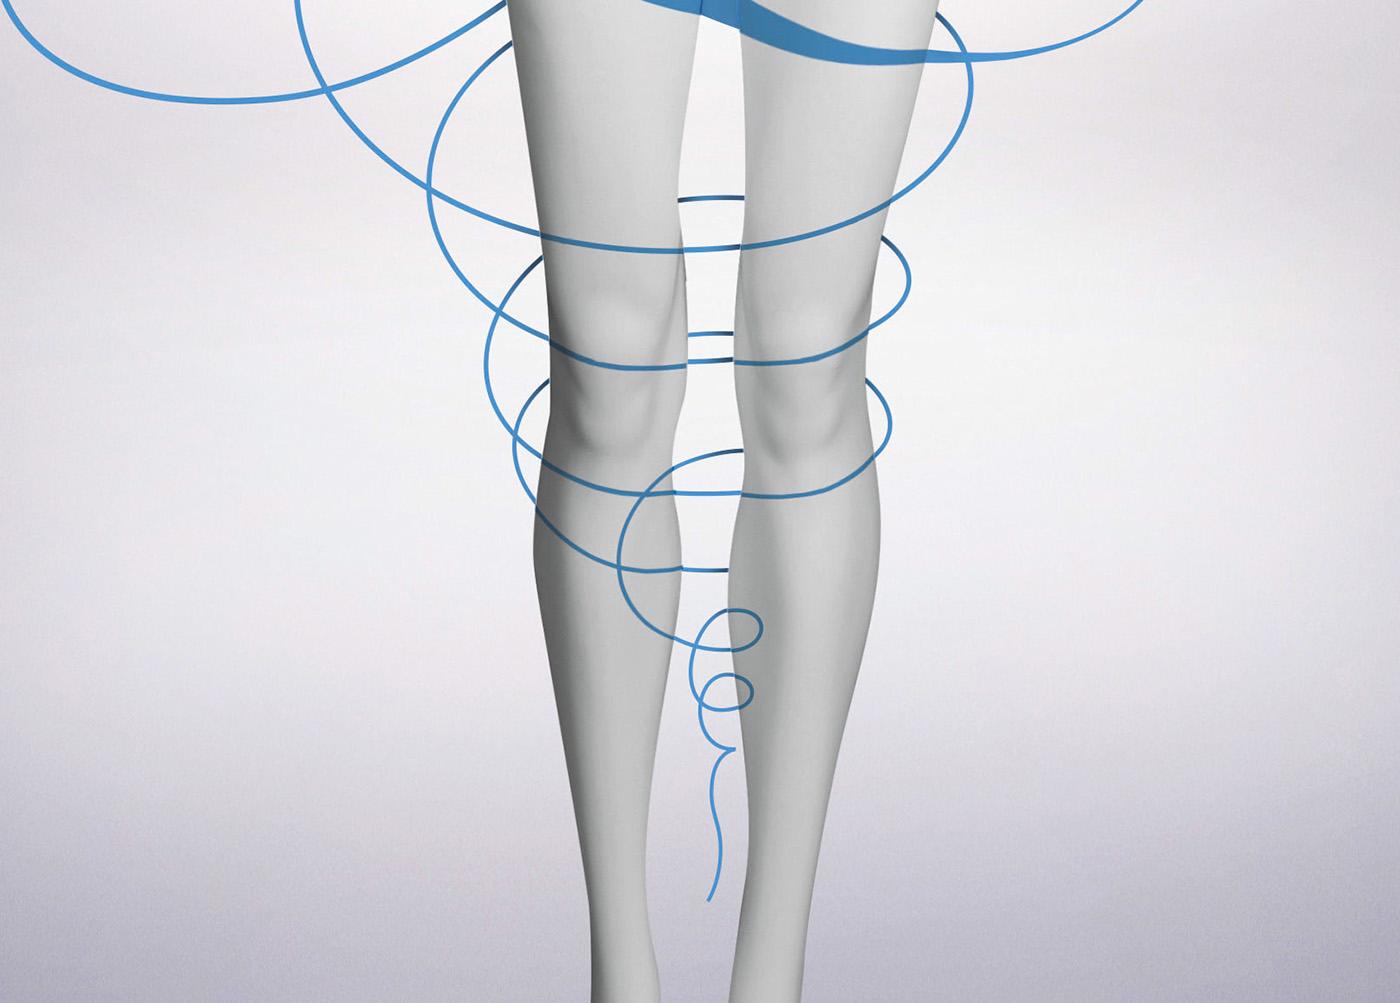 SHOPPING_BLUE_Closeup_Legs_resized_1400.jpg